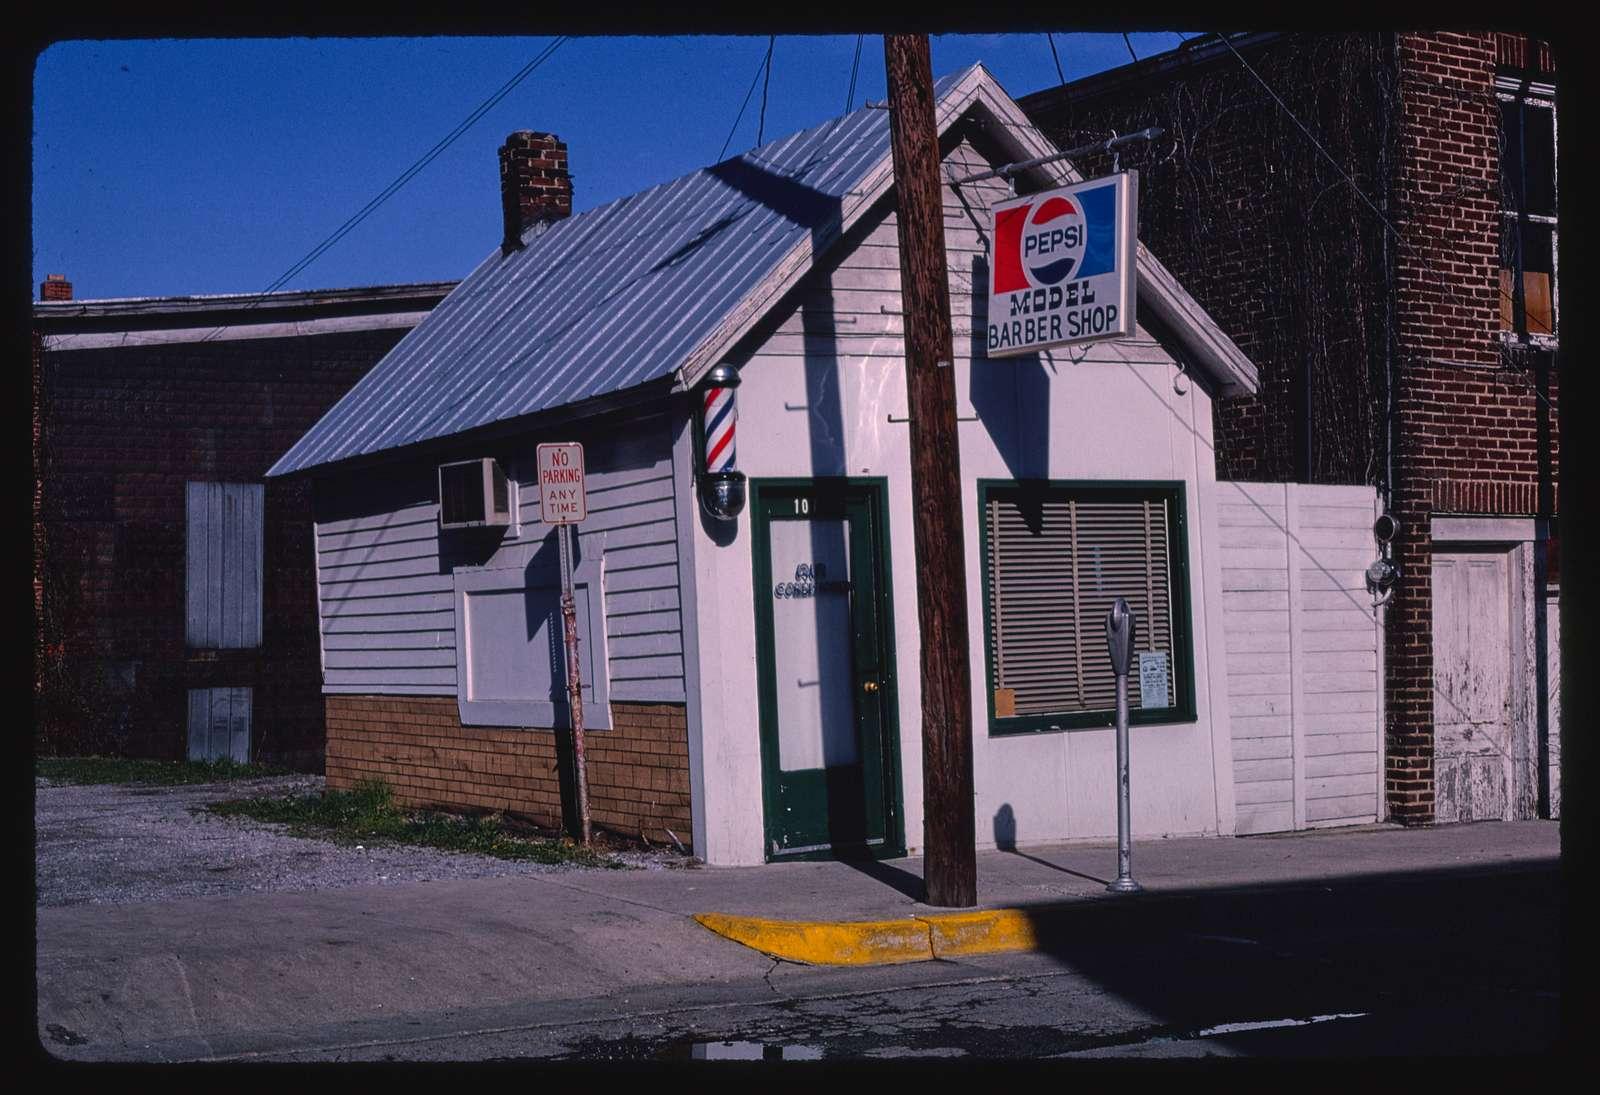 Model Barber Shop, 107 Broad Street, Marion, Virginia